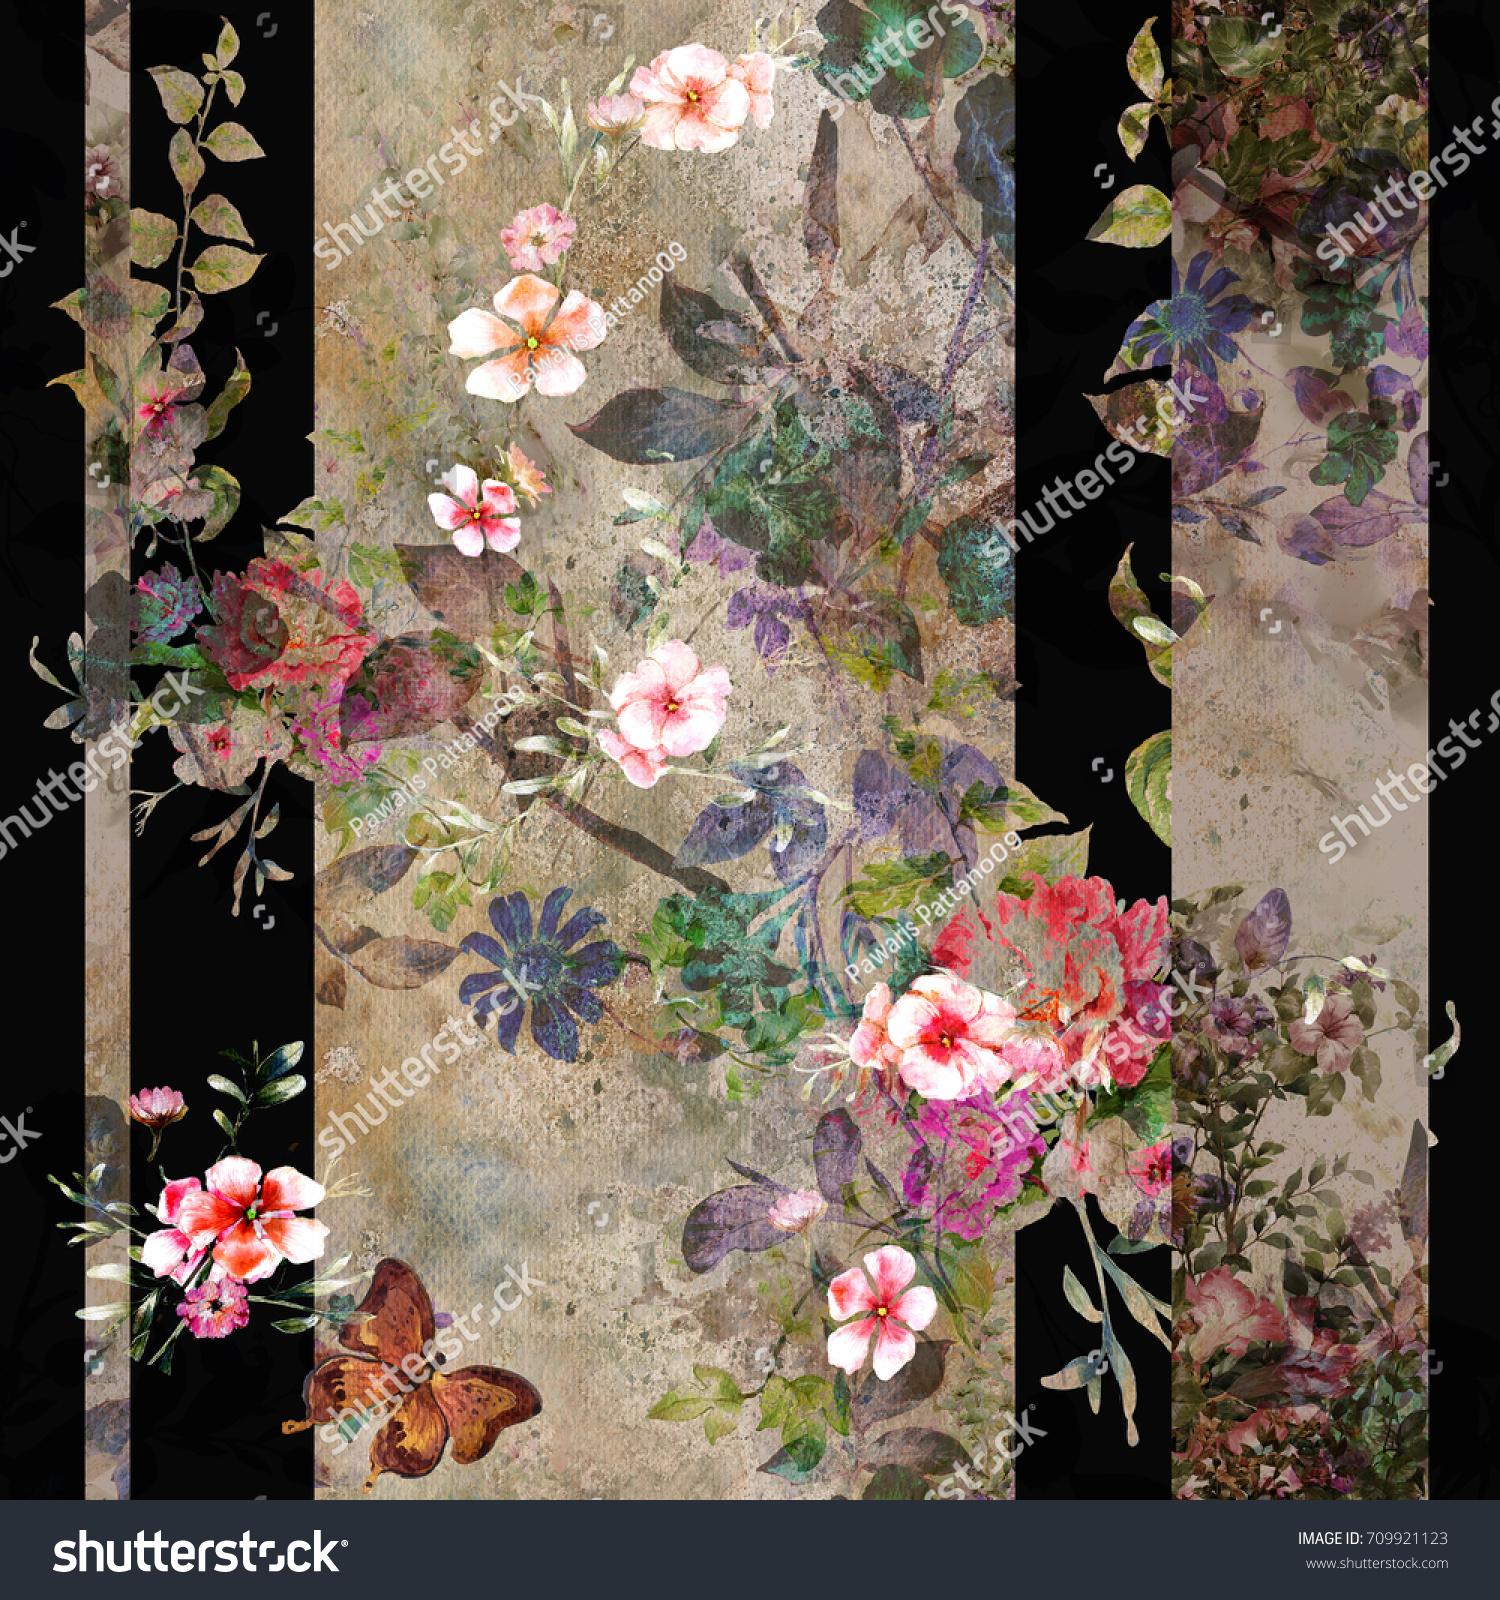 Dark Flowers Botanic Images Stock Photos Vectors Shutterstock